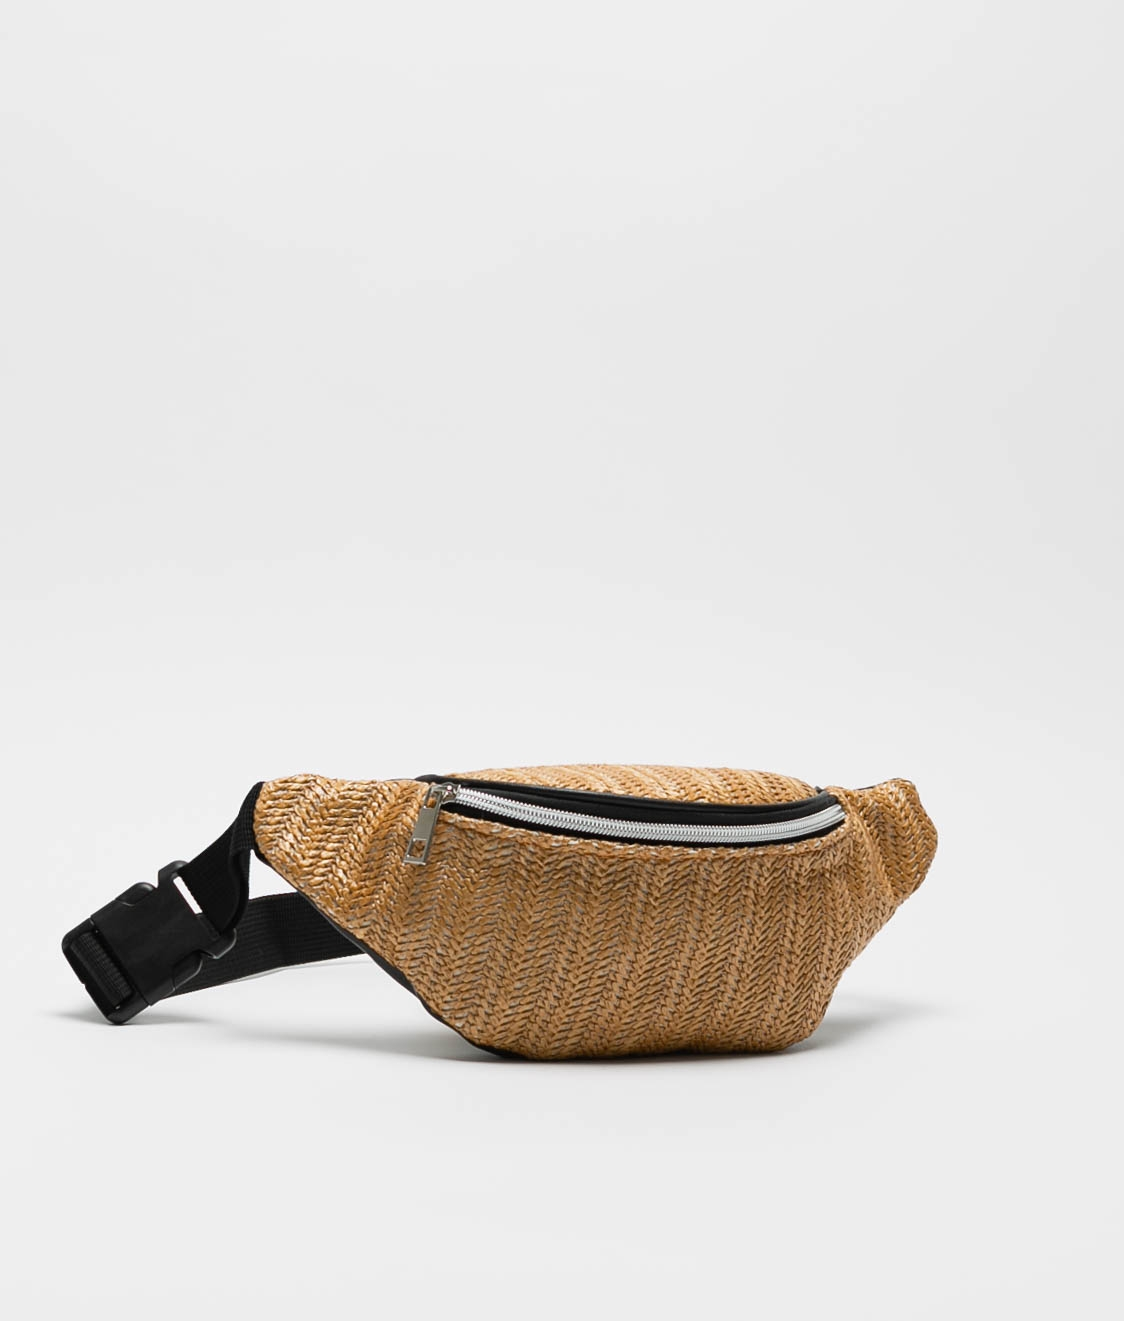 WAIST BAG NOA - CAMEL